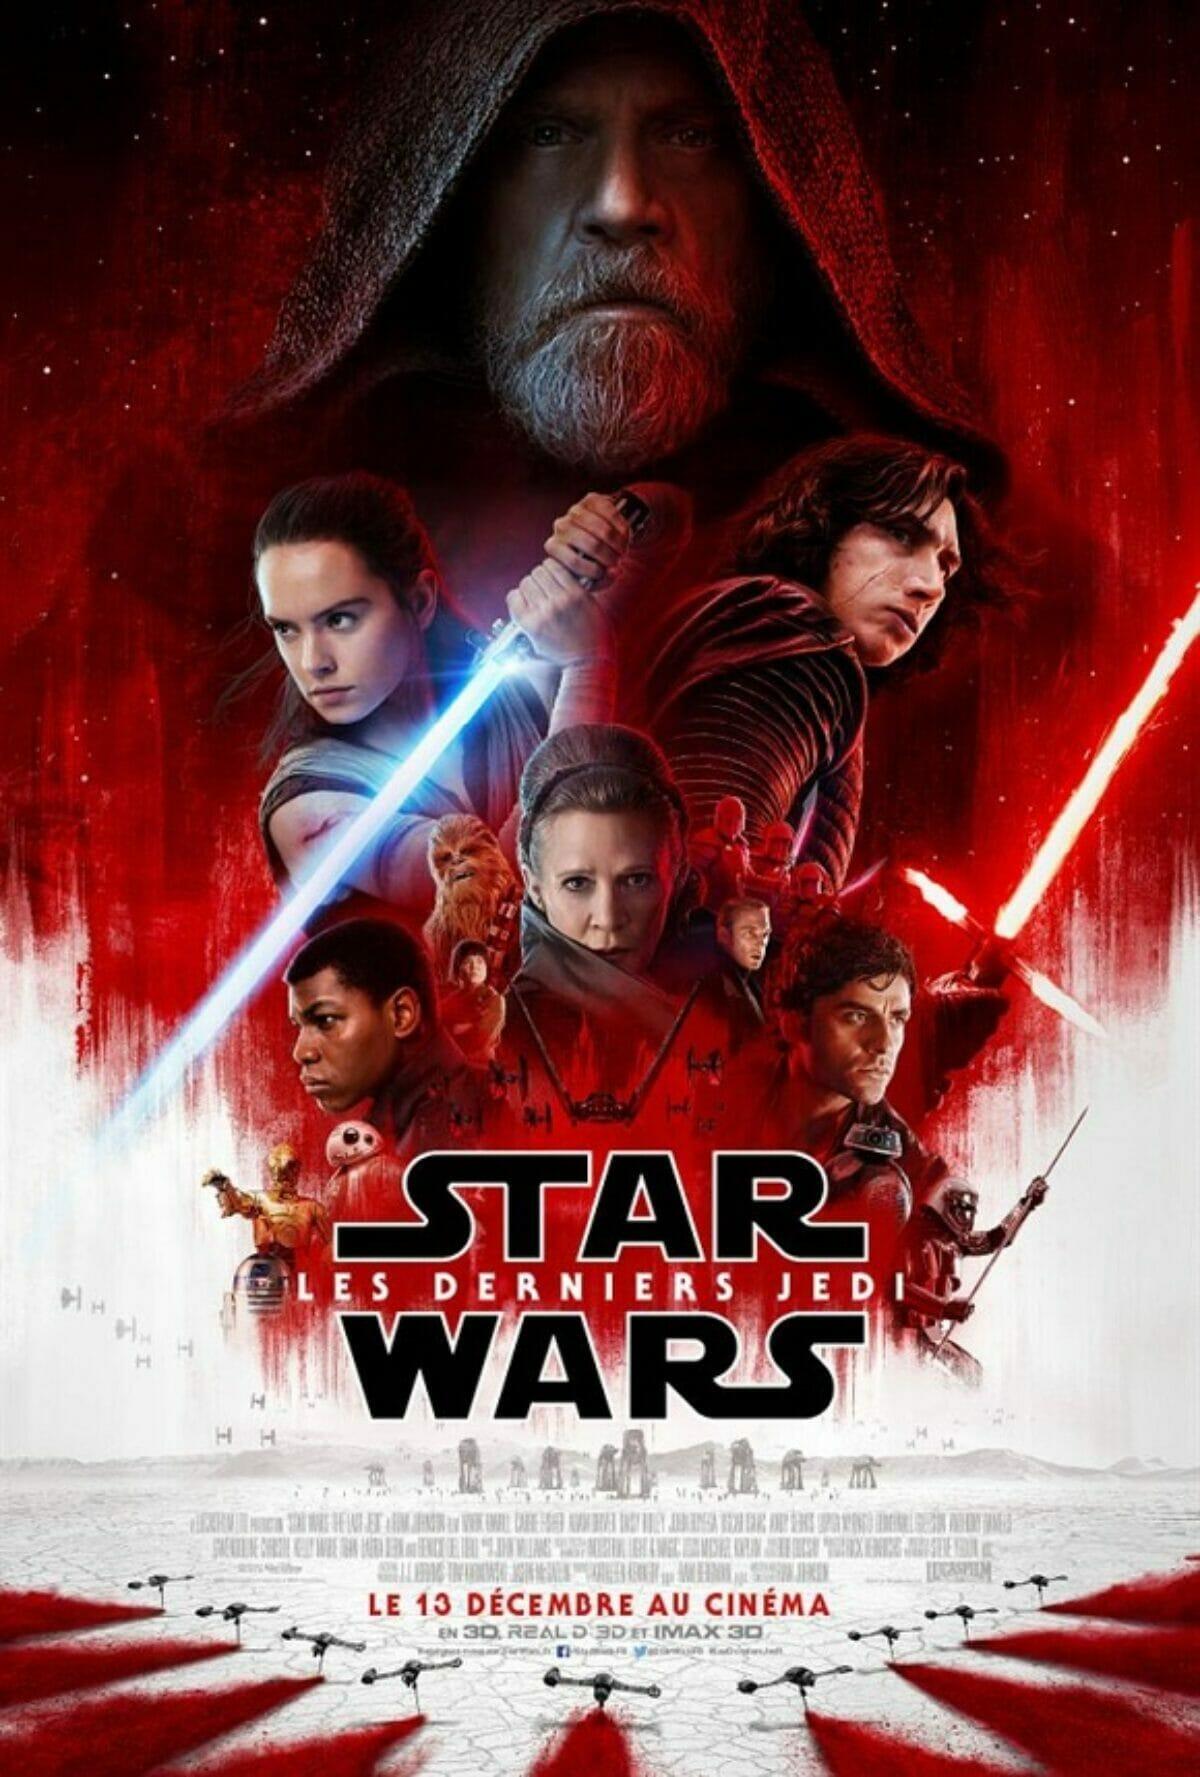 Star-Wars-Le-Derniers-Jedi-poster